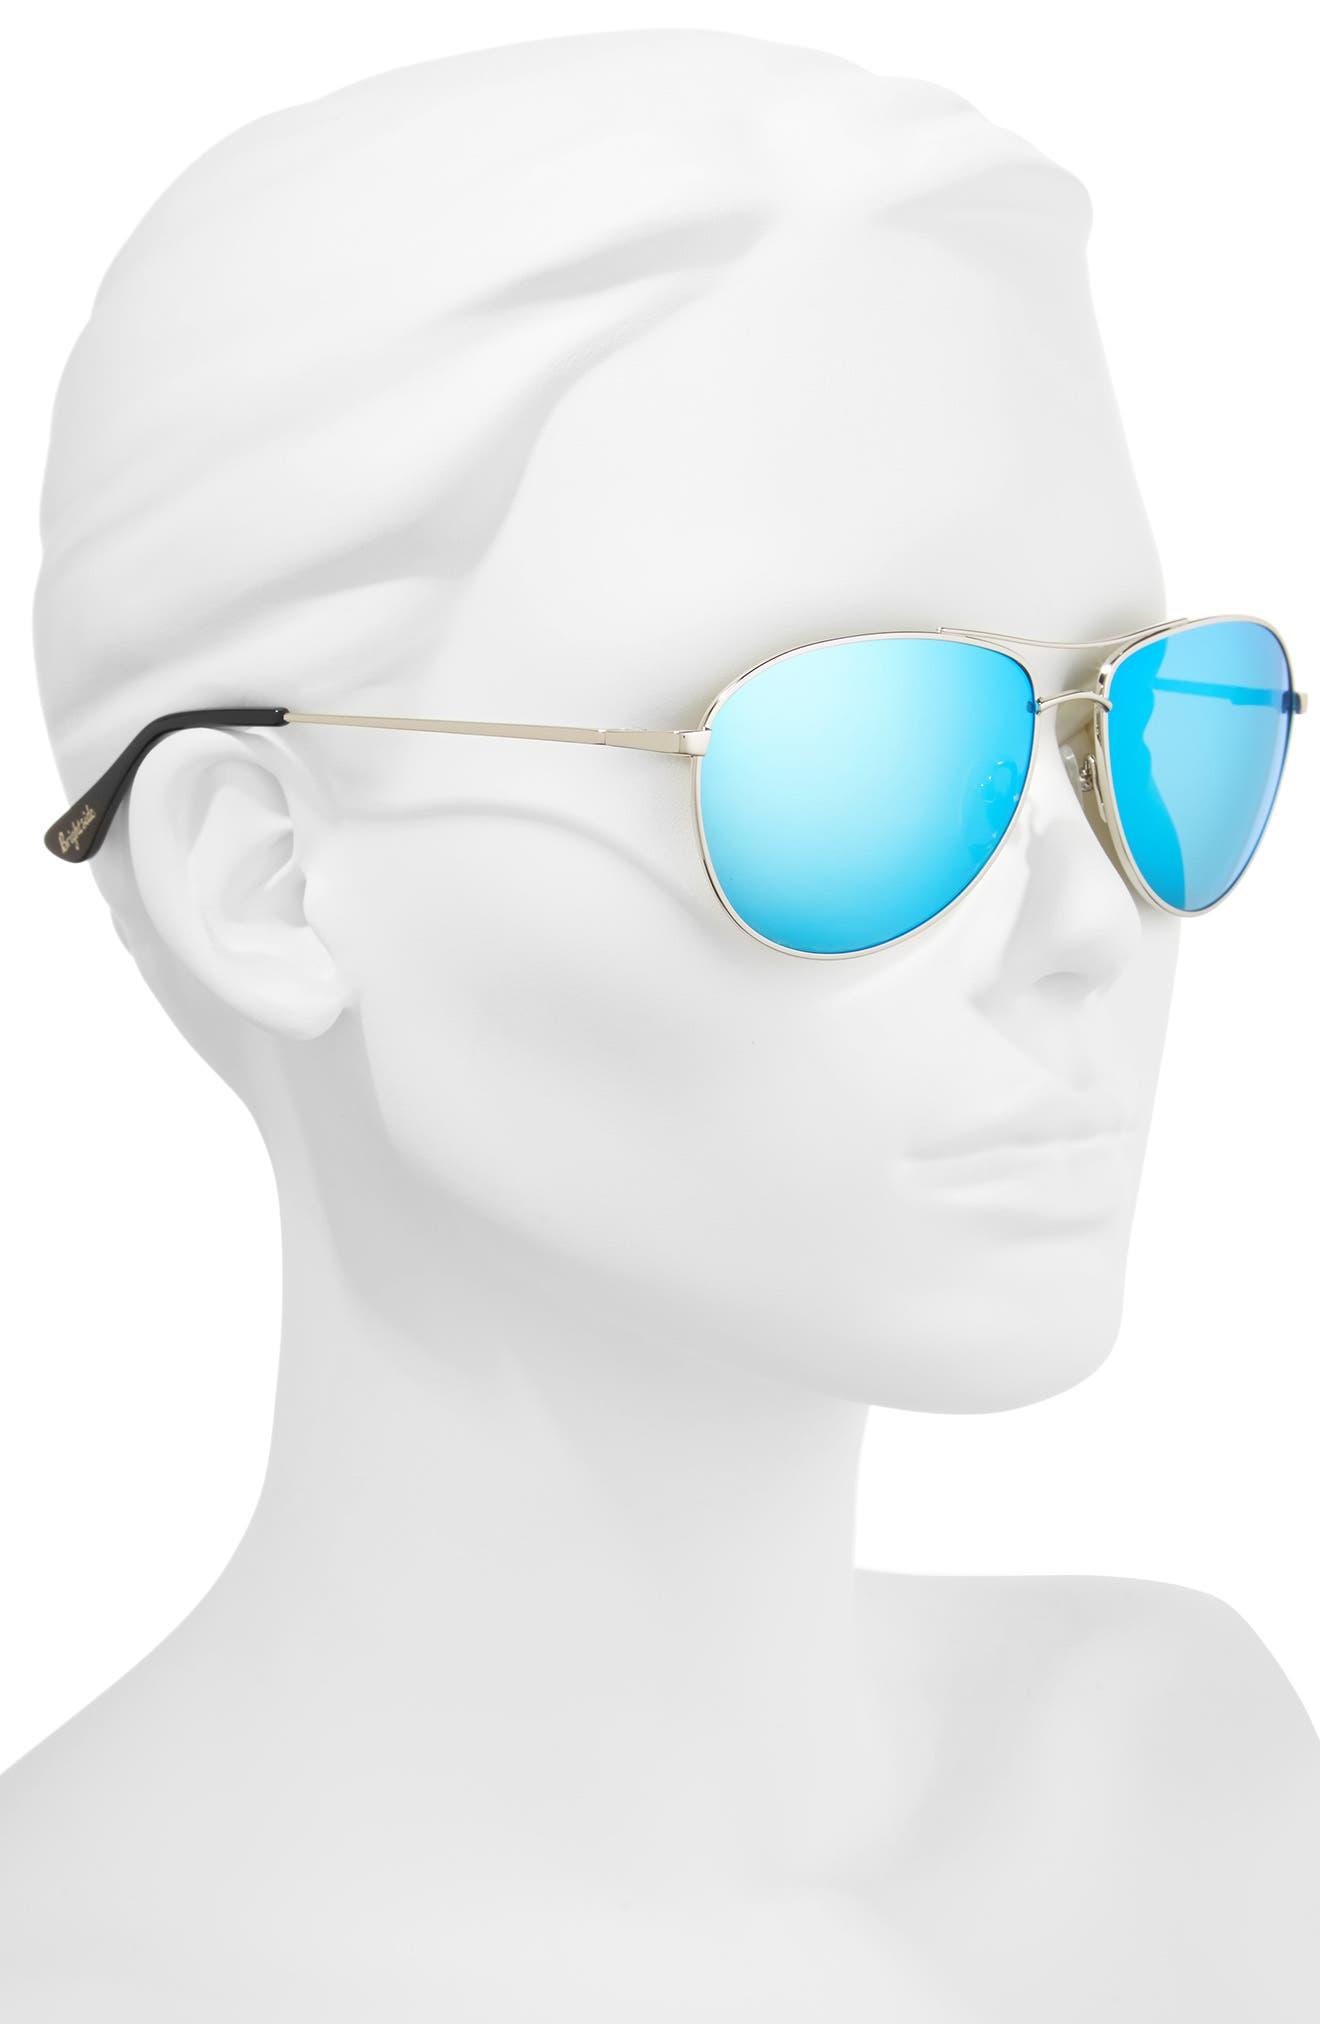 Orville 58mm Mirrored Aviator Sunglasses,                             Alternate thumbnail 2, color,                             Silver/ Blue Mirror